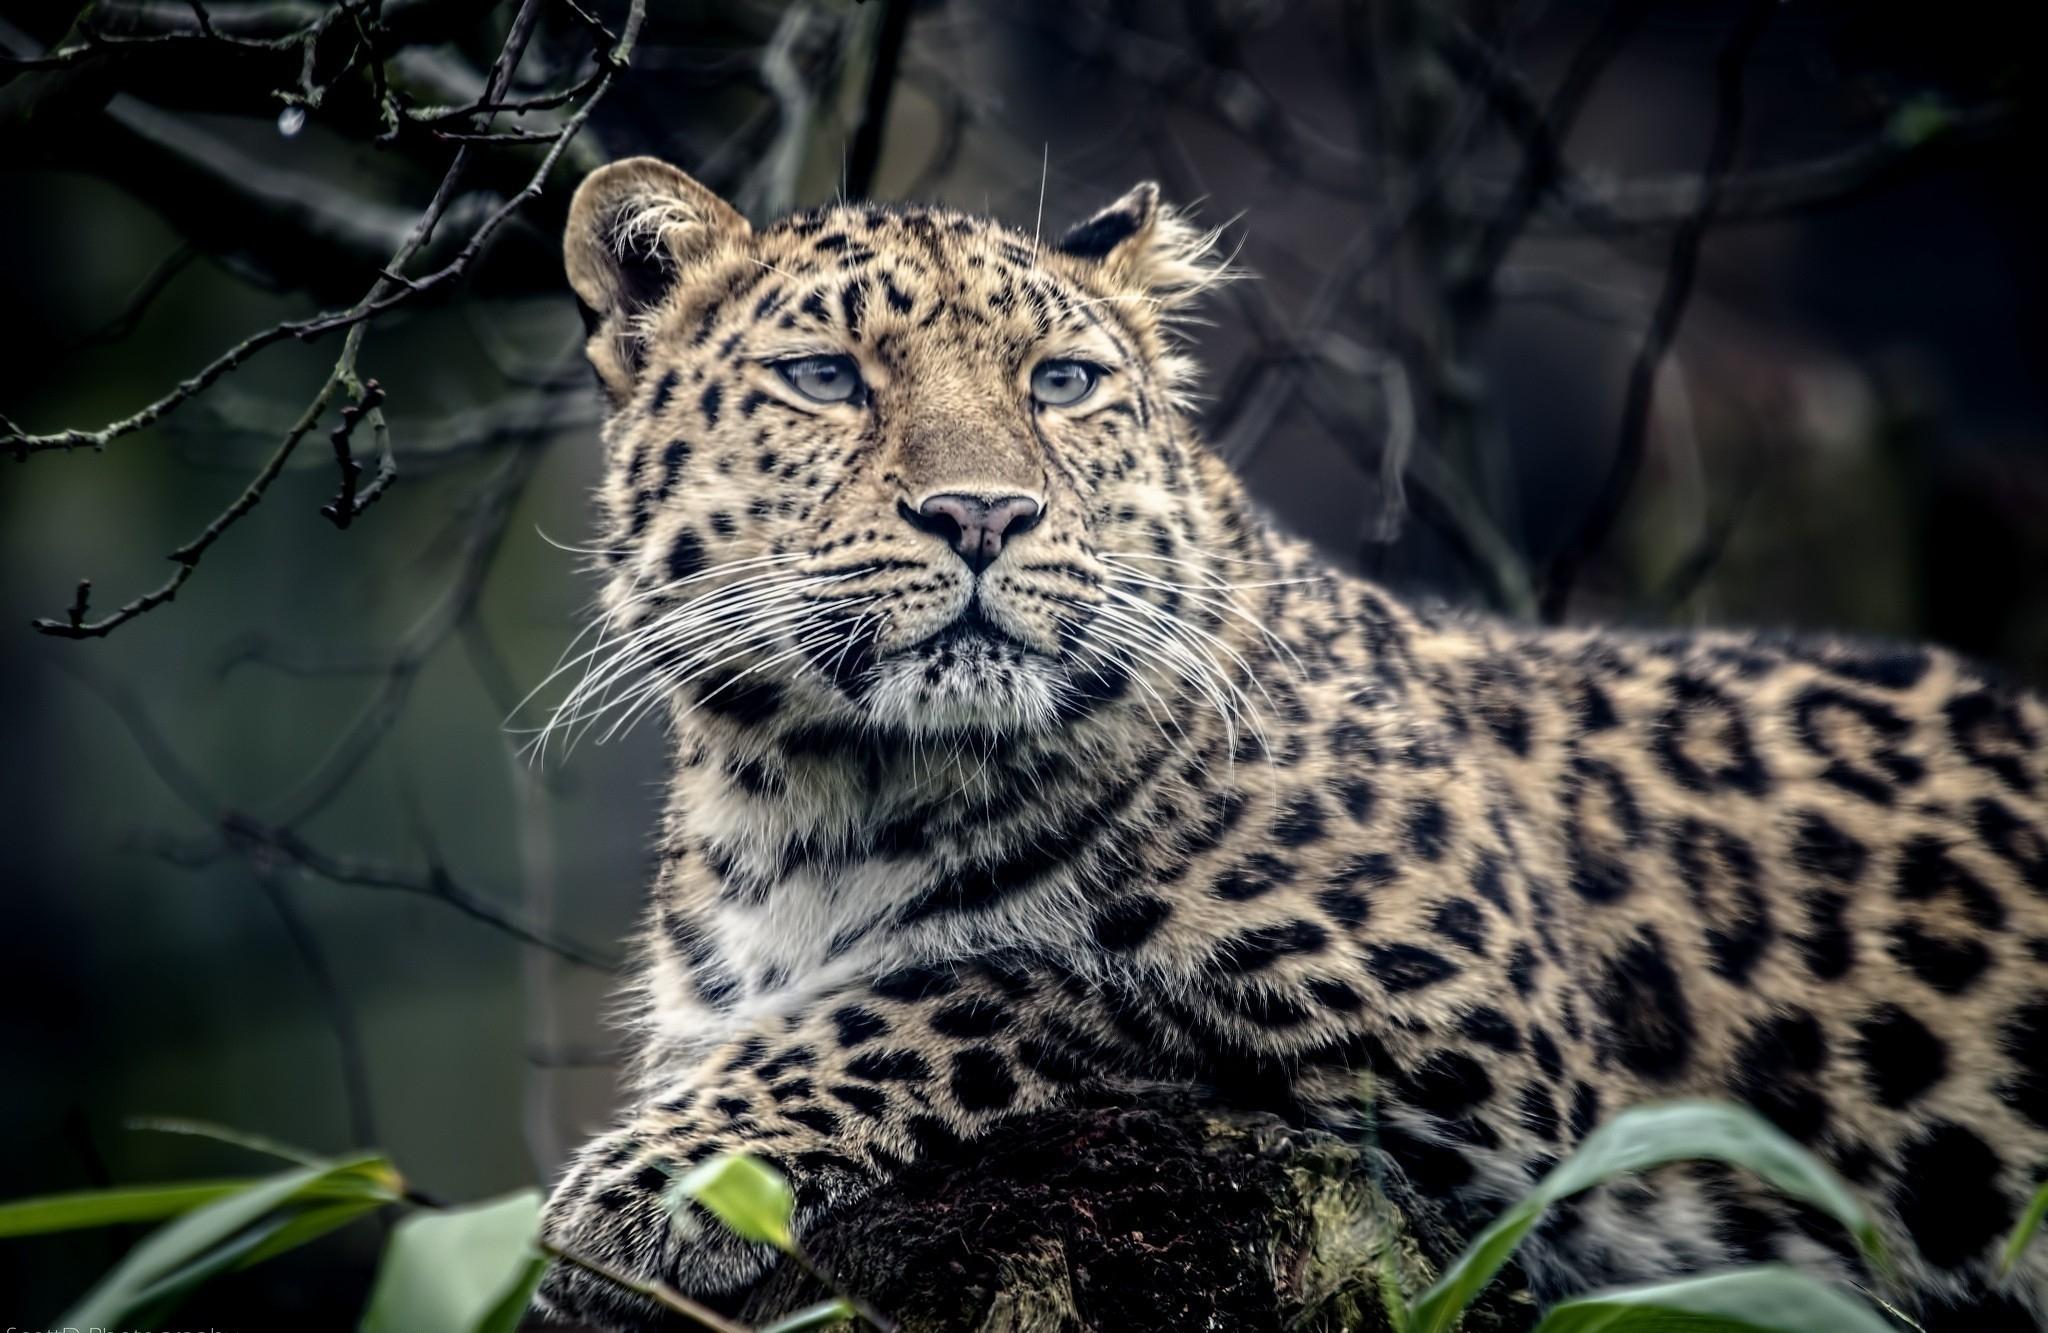 wildlife sadness big cats Zoo whiskers leopard Jaguar snow leopard look predator fauna mammal vertebrate cat